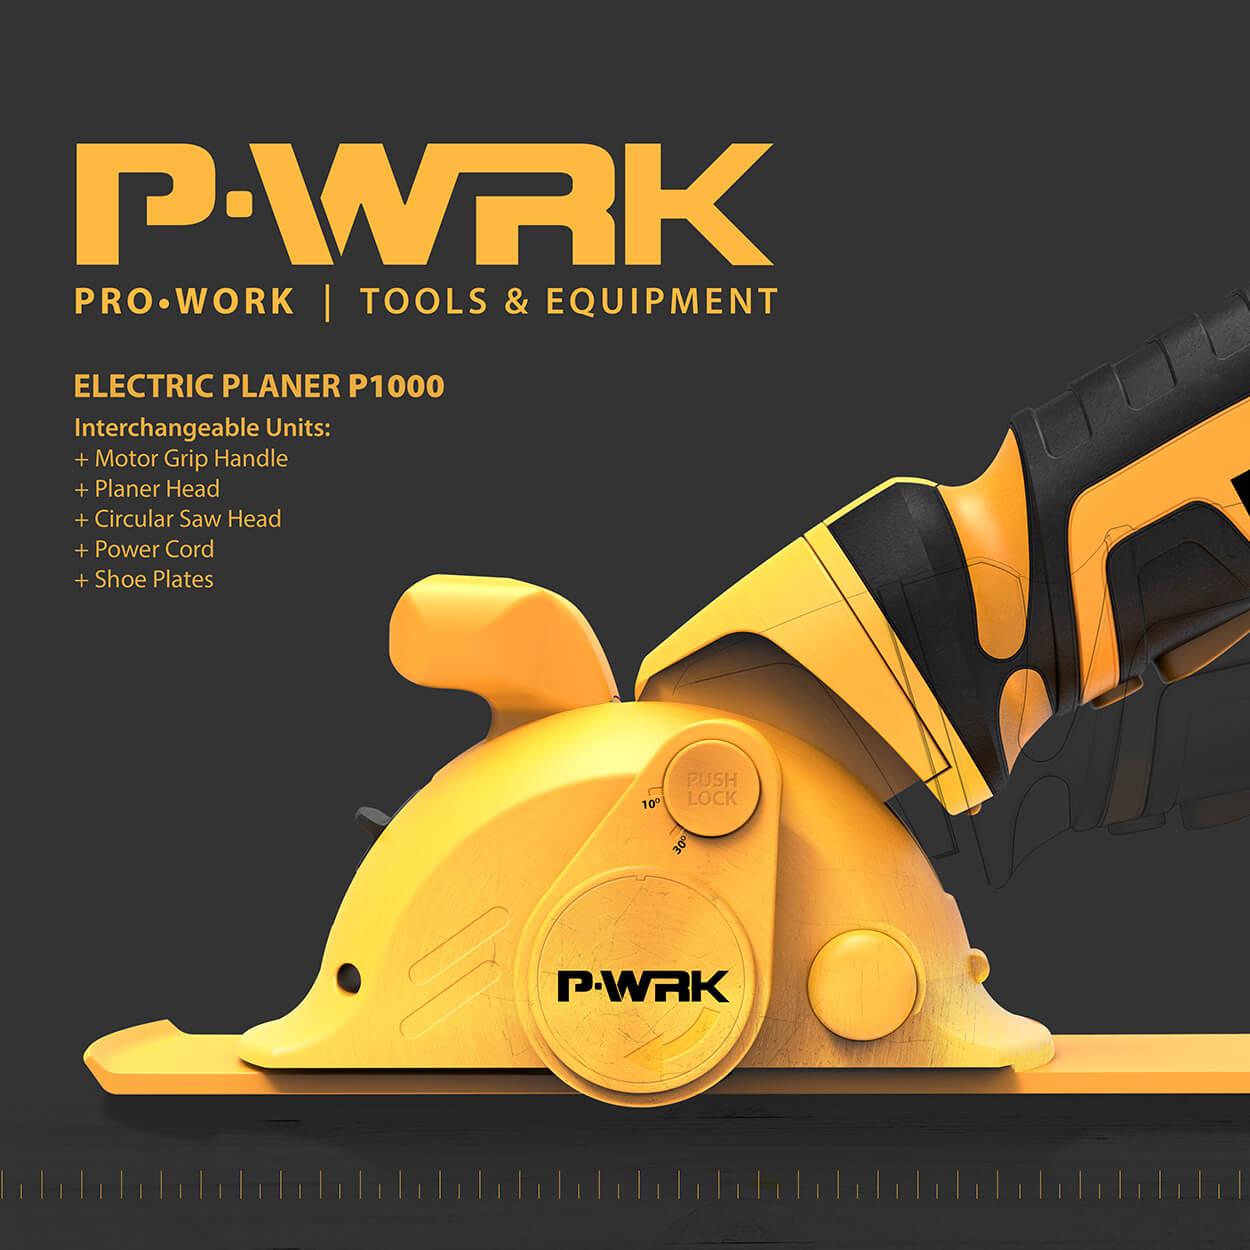 ProWork